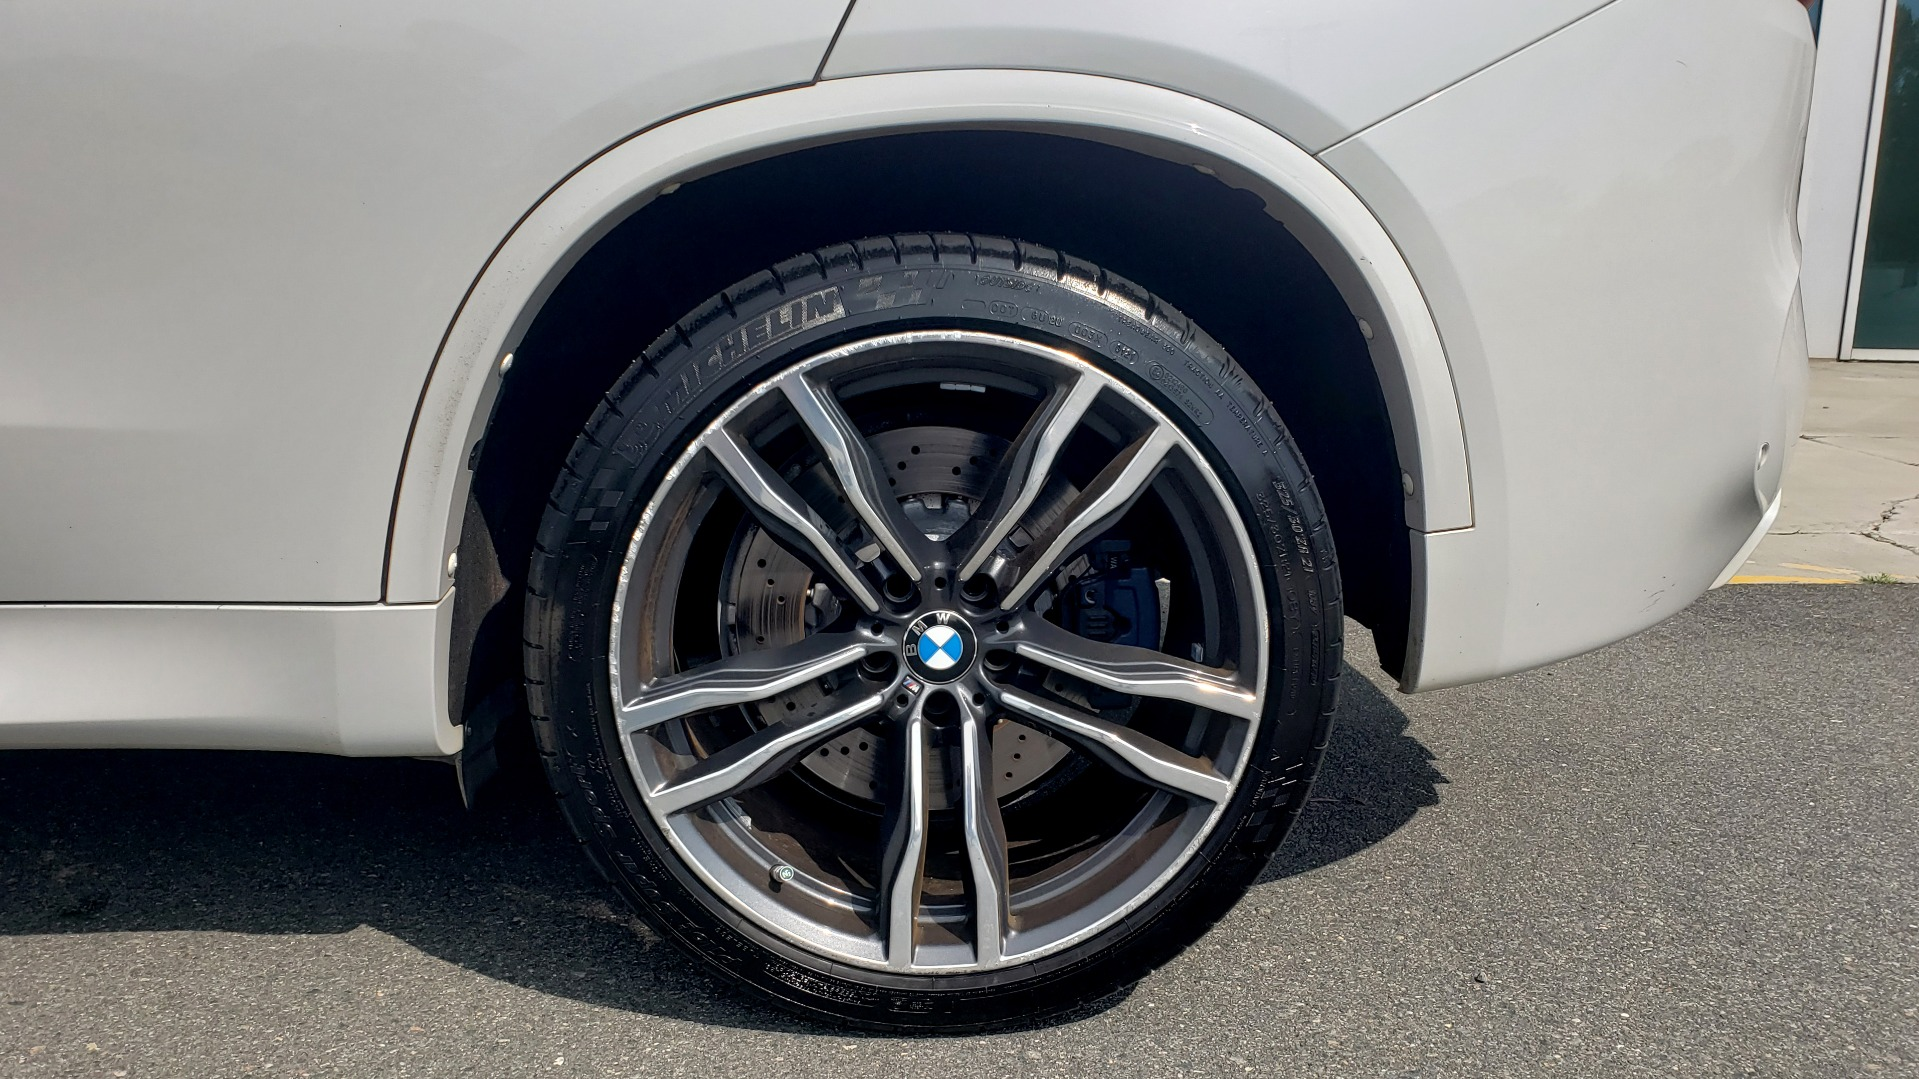 Used 2017 BMW X5 M EXECUTIVE PKG / NAV / DRVR ASST / BSM / HUD / HTD STS / WIFI for sale Sold at Formula Imports in Charlotte NC 28227 86